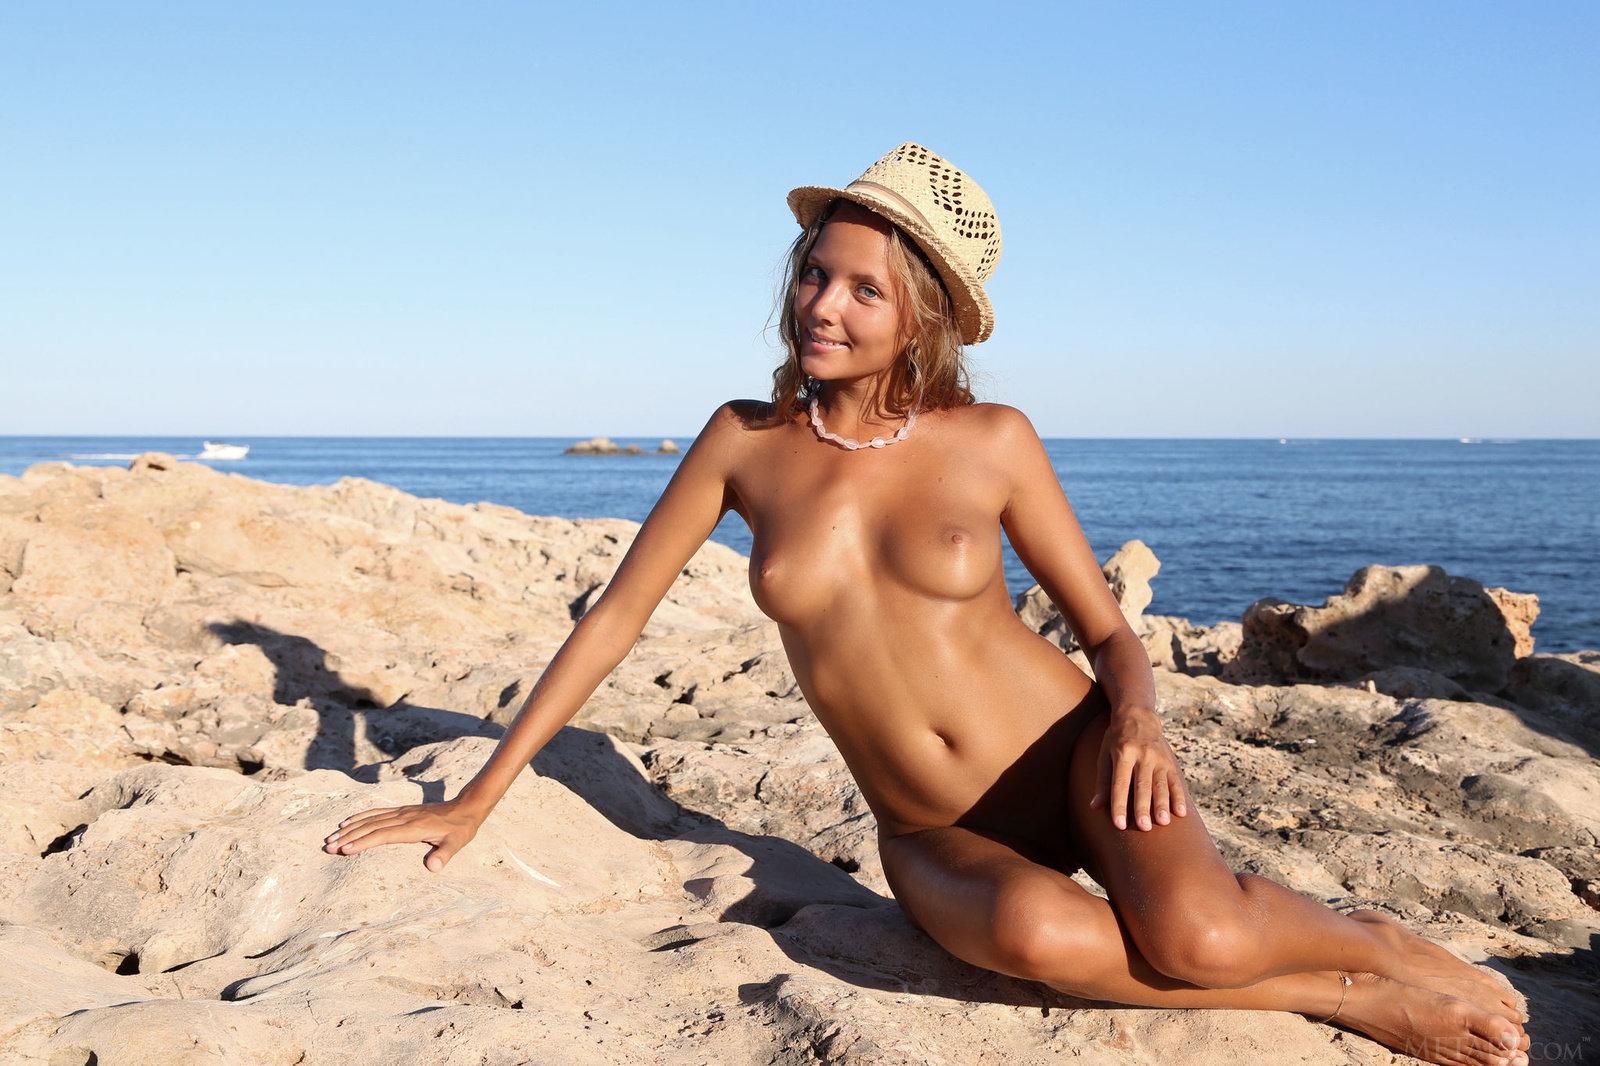 Mango a nude, hottest adult film stars